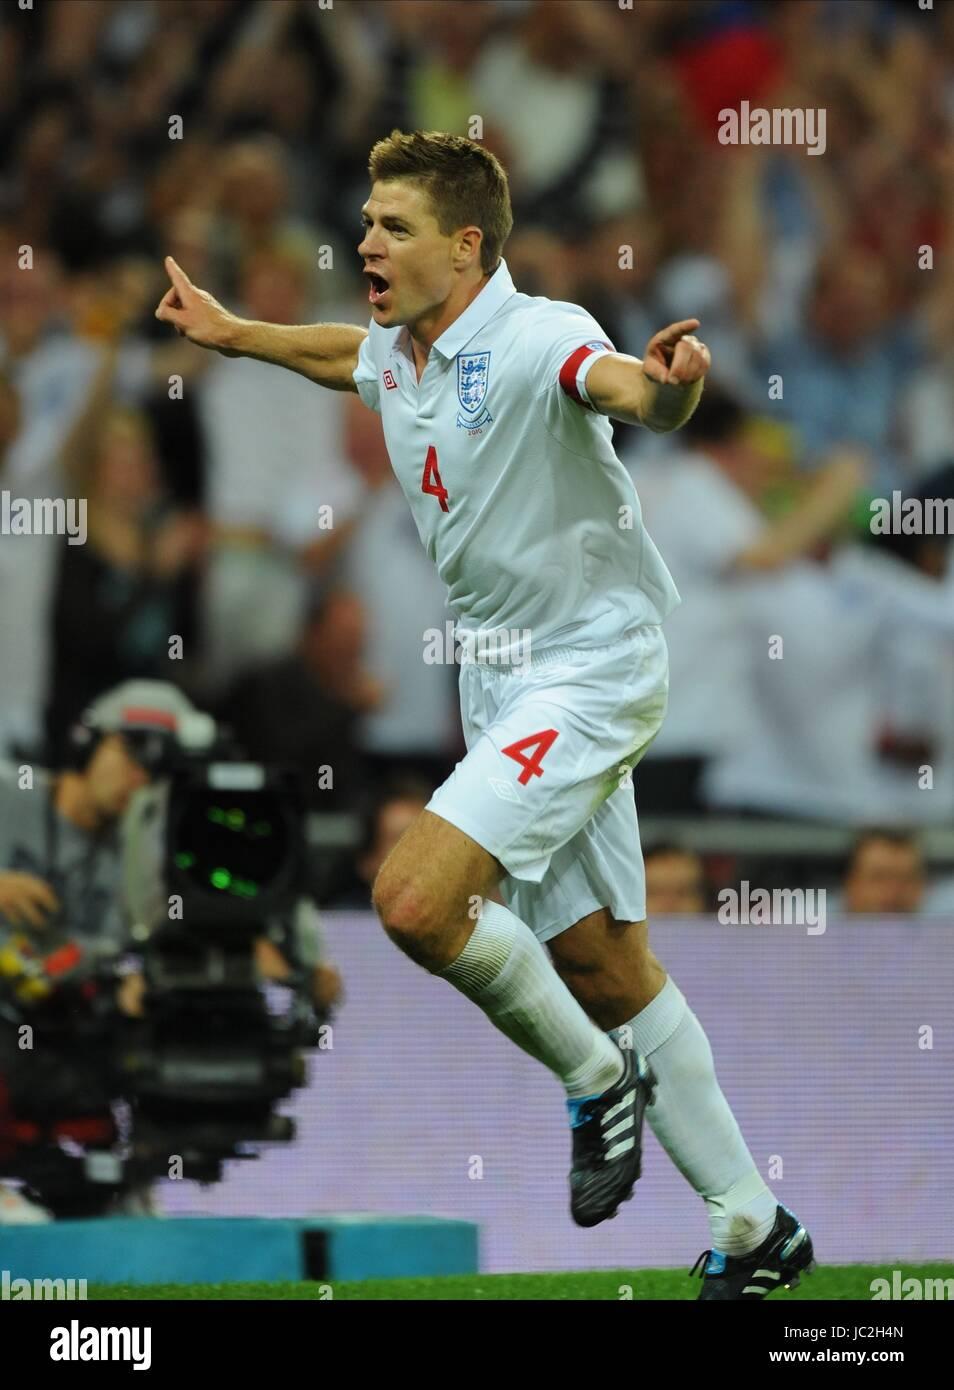 STEVEN GERRARD CELEBRATES 2ND GOAL, ENGLAND, ENGLAND V HUNGARY, INTERNATIONAL FRIENDLEY, 2010 - Stock Image